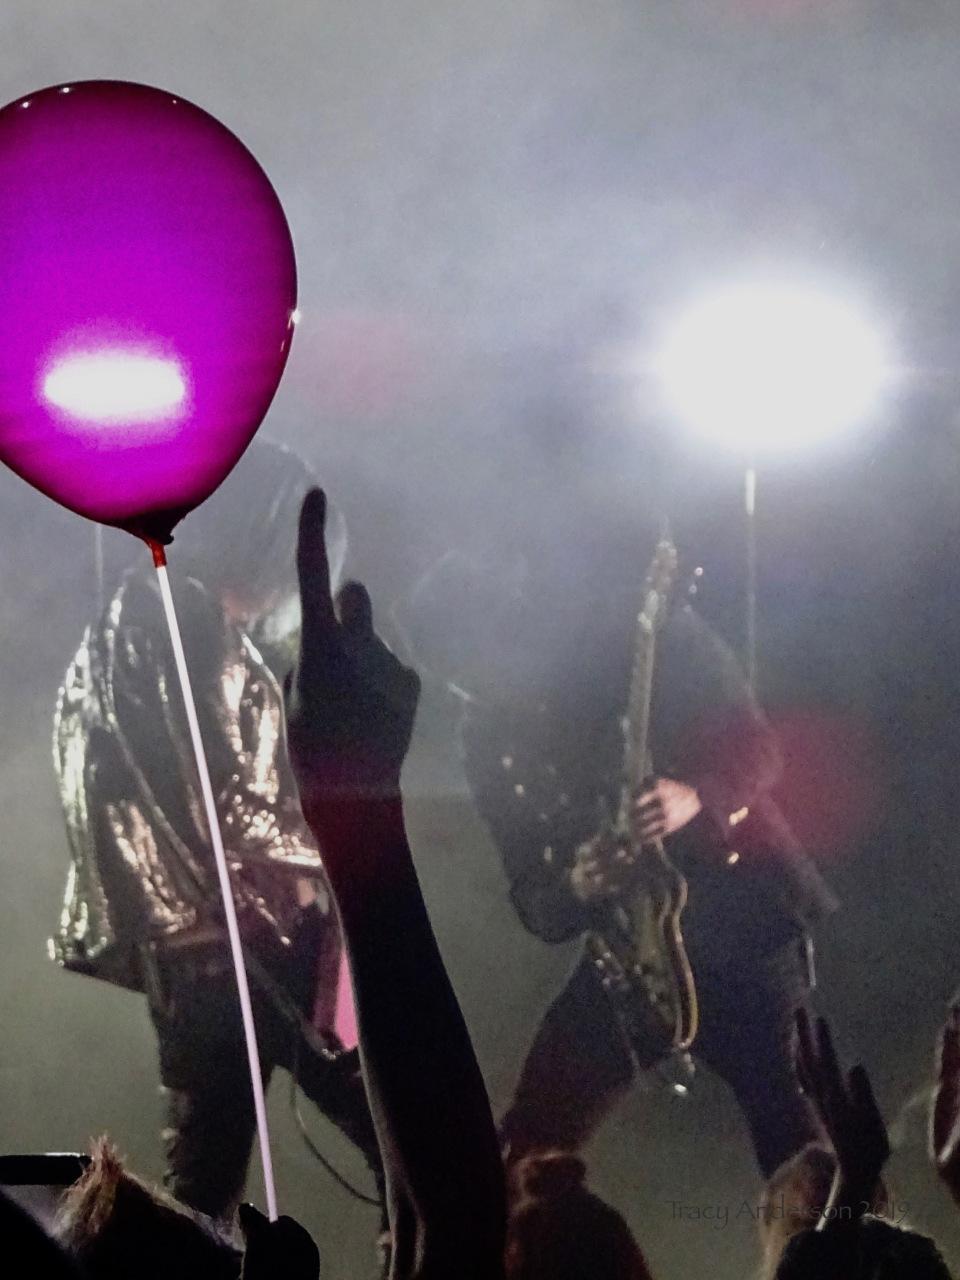 Marianas Trench balloons Suspending Gravity Tour Edmonton Northern Alberta Jubilee Auditorium Mar 26 2019